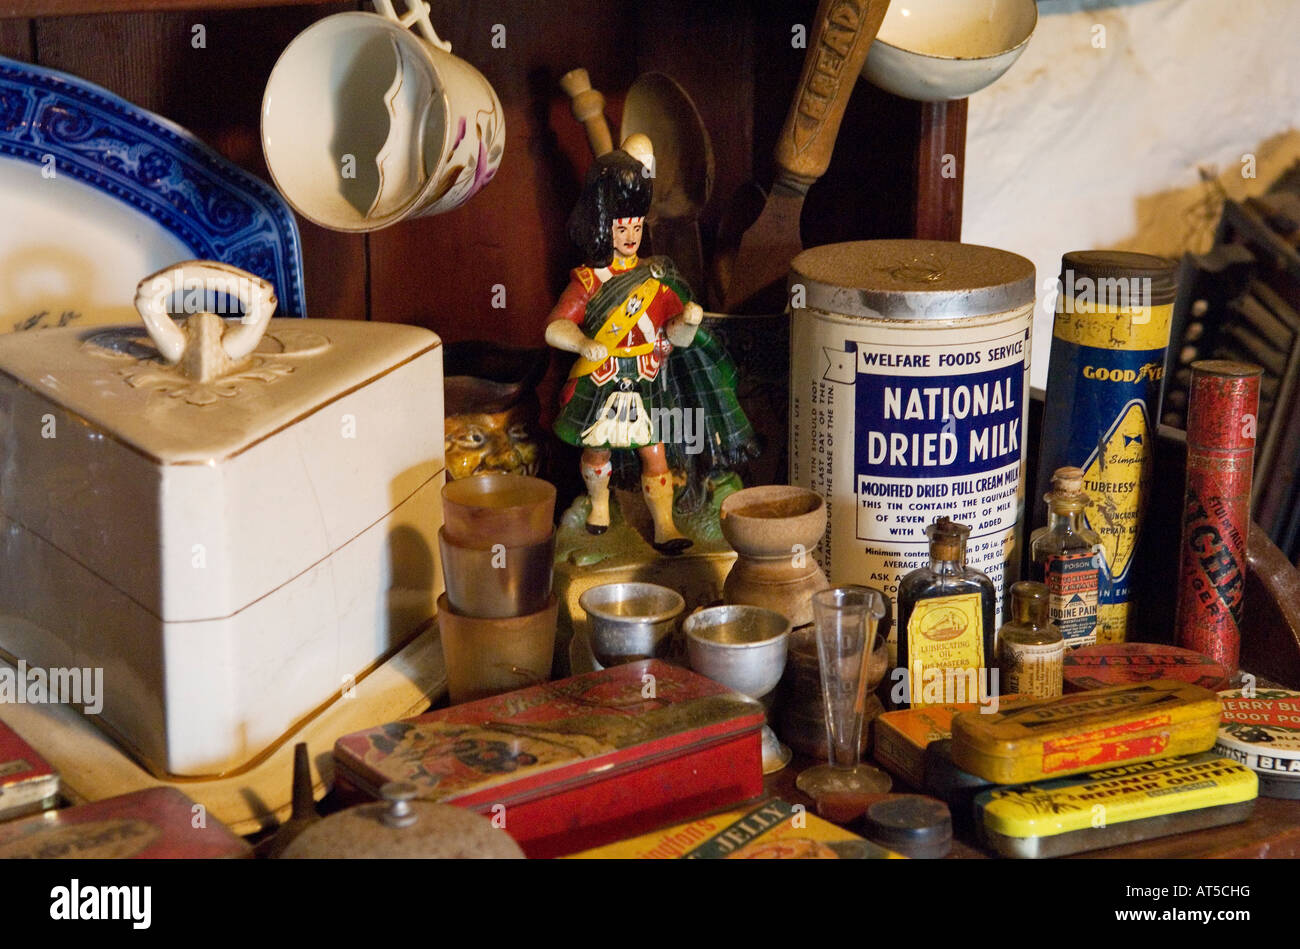 Skye Museum Of Island Life At Kilmuir Isle Scotland Rural Scottish Cottage Interior With Everyday Bric A Brac